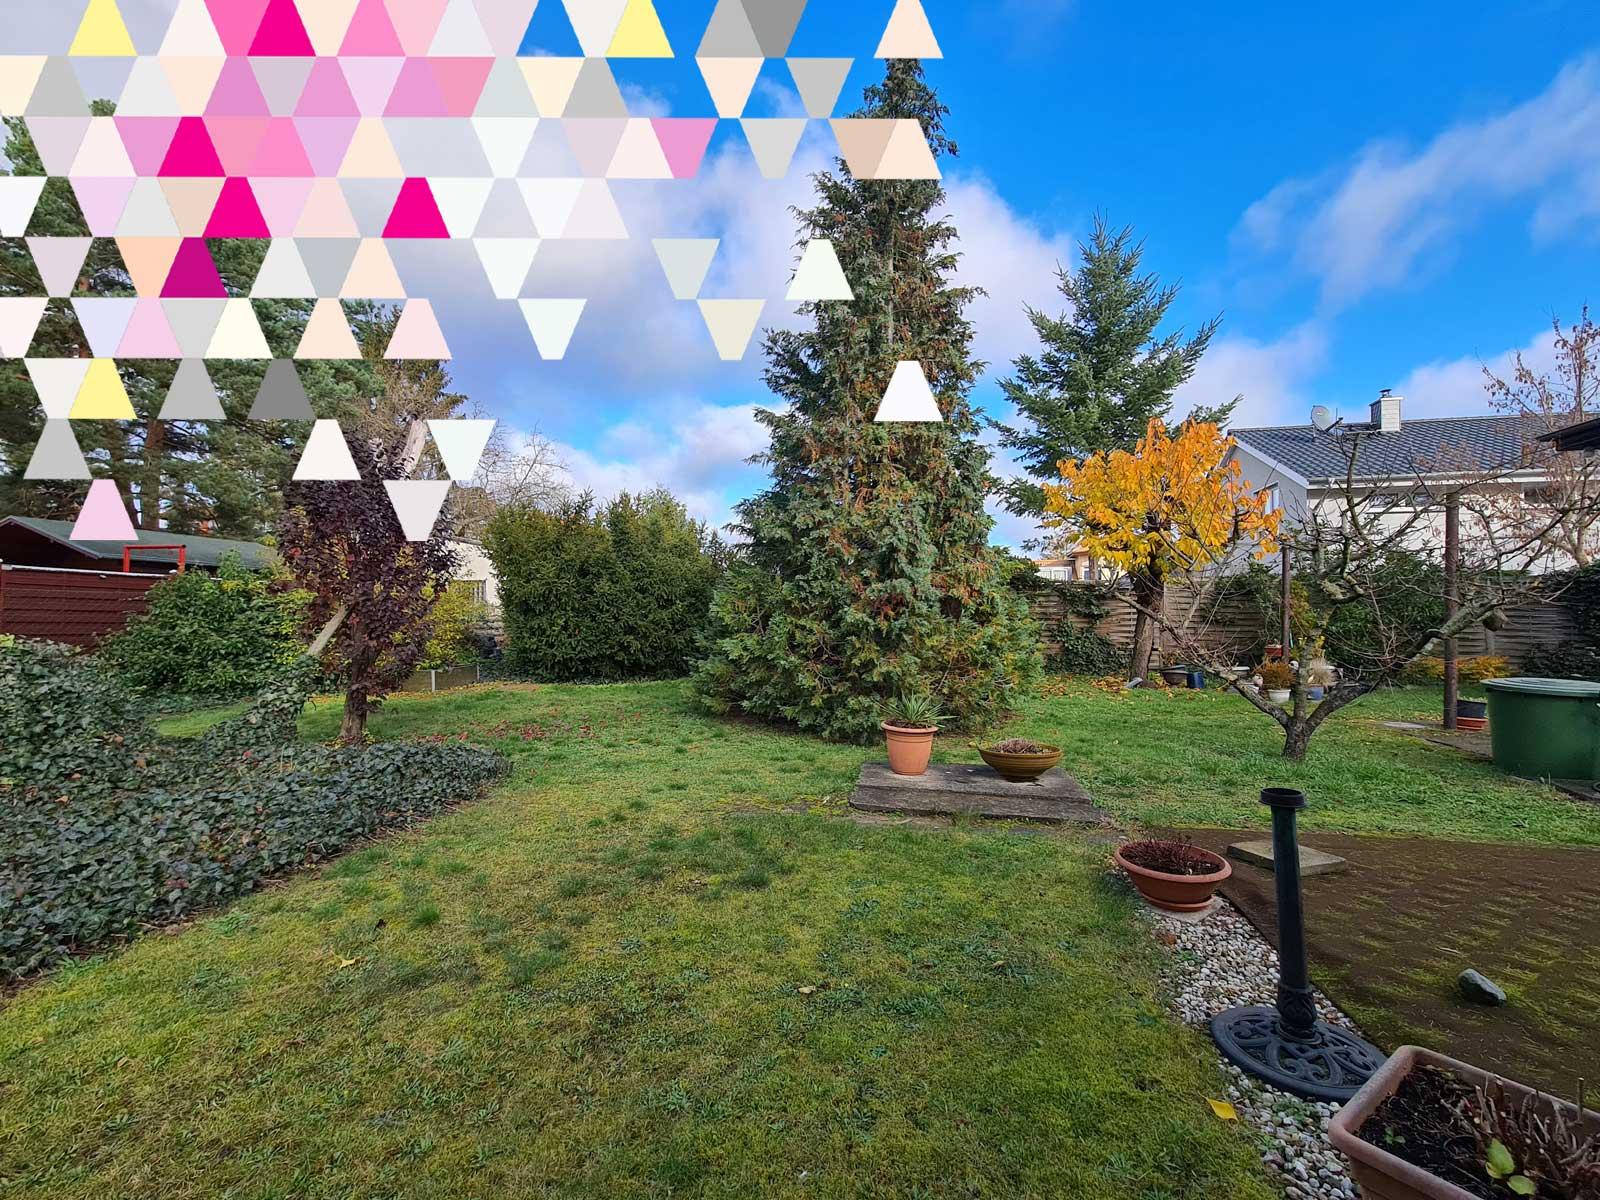 Grundstück | Verkauft mit Bauträgerbindung | ca. 462 m² | Berlin-Kaulsdorf